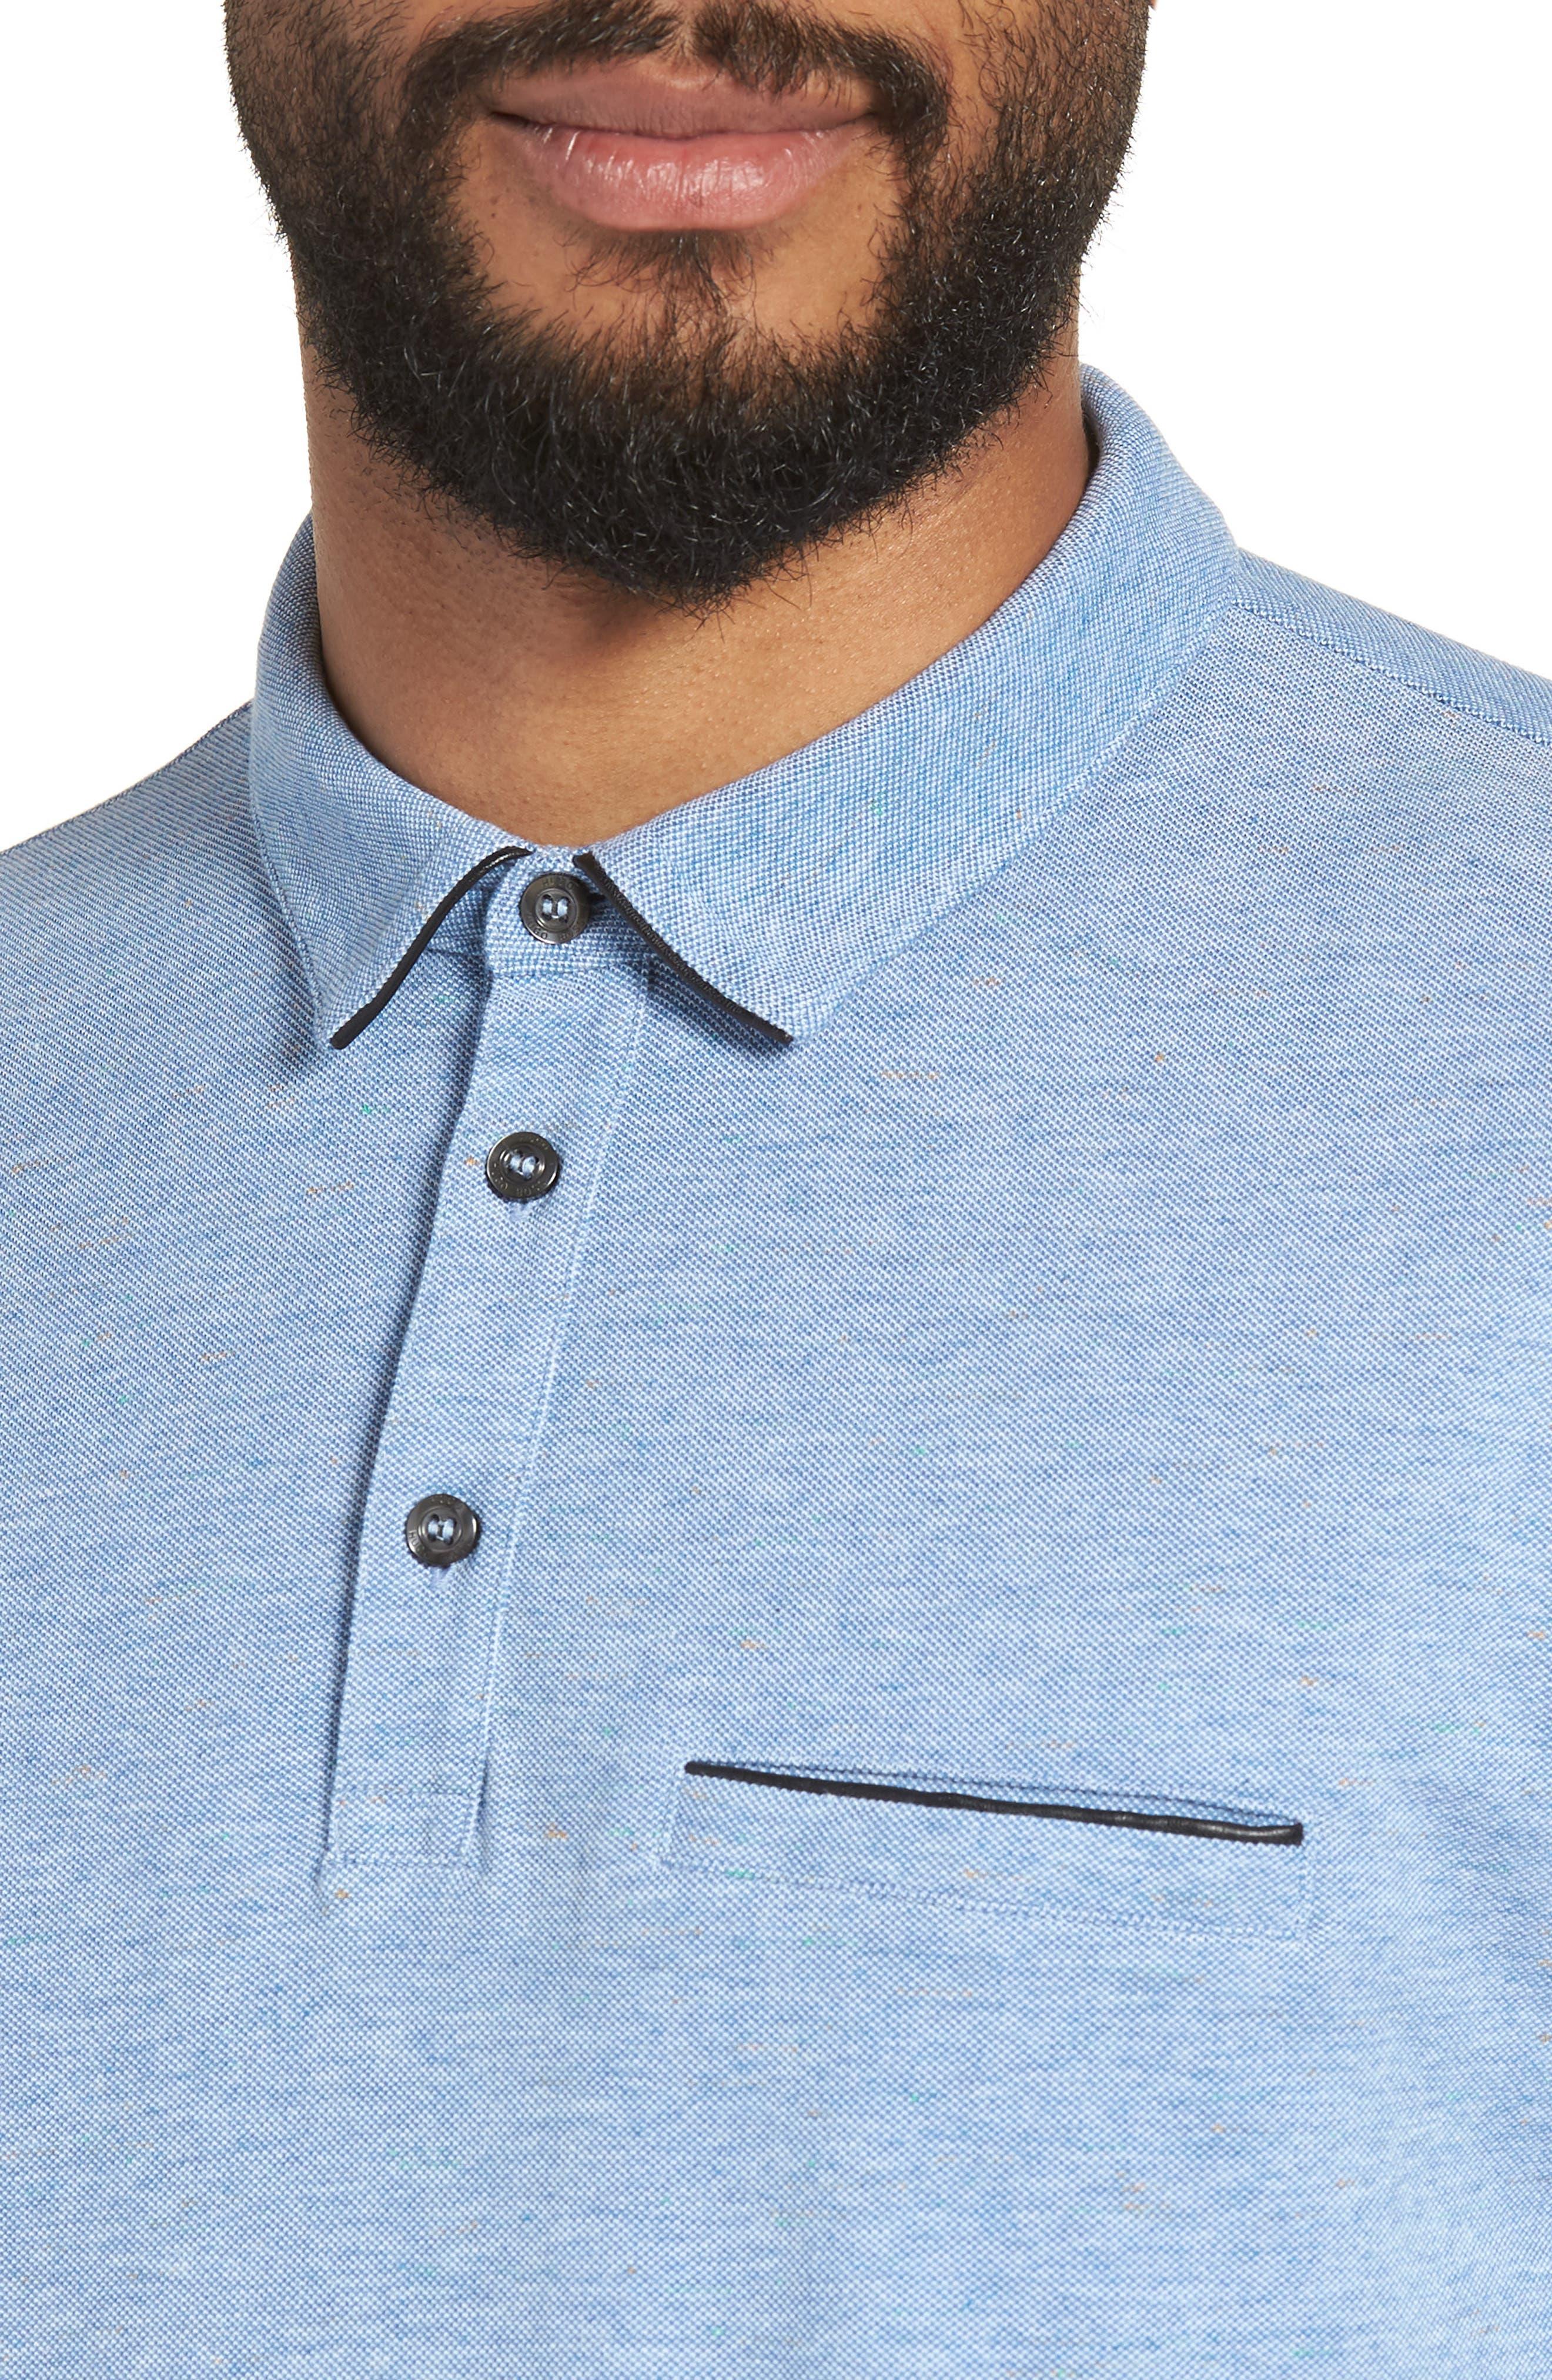 Darrow Cotton Polo Shirt,                             Alternate thumbnail 4, color,                             Blue